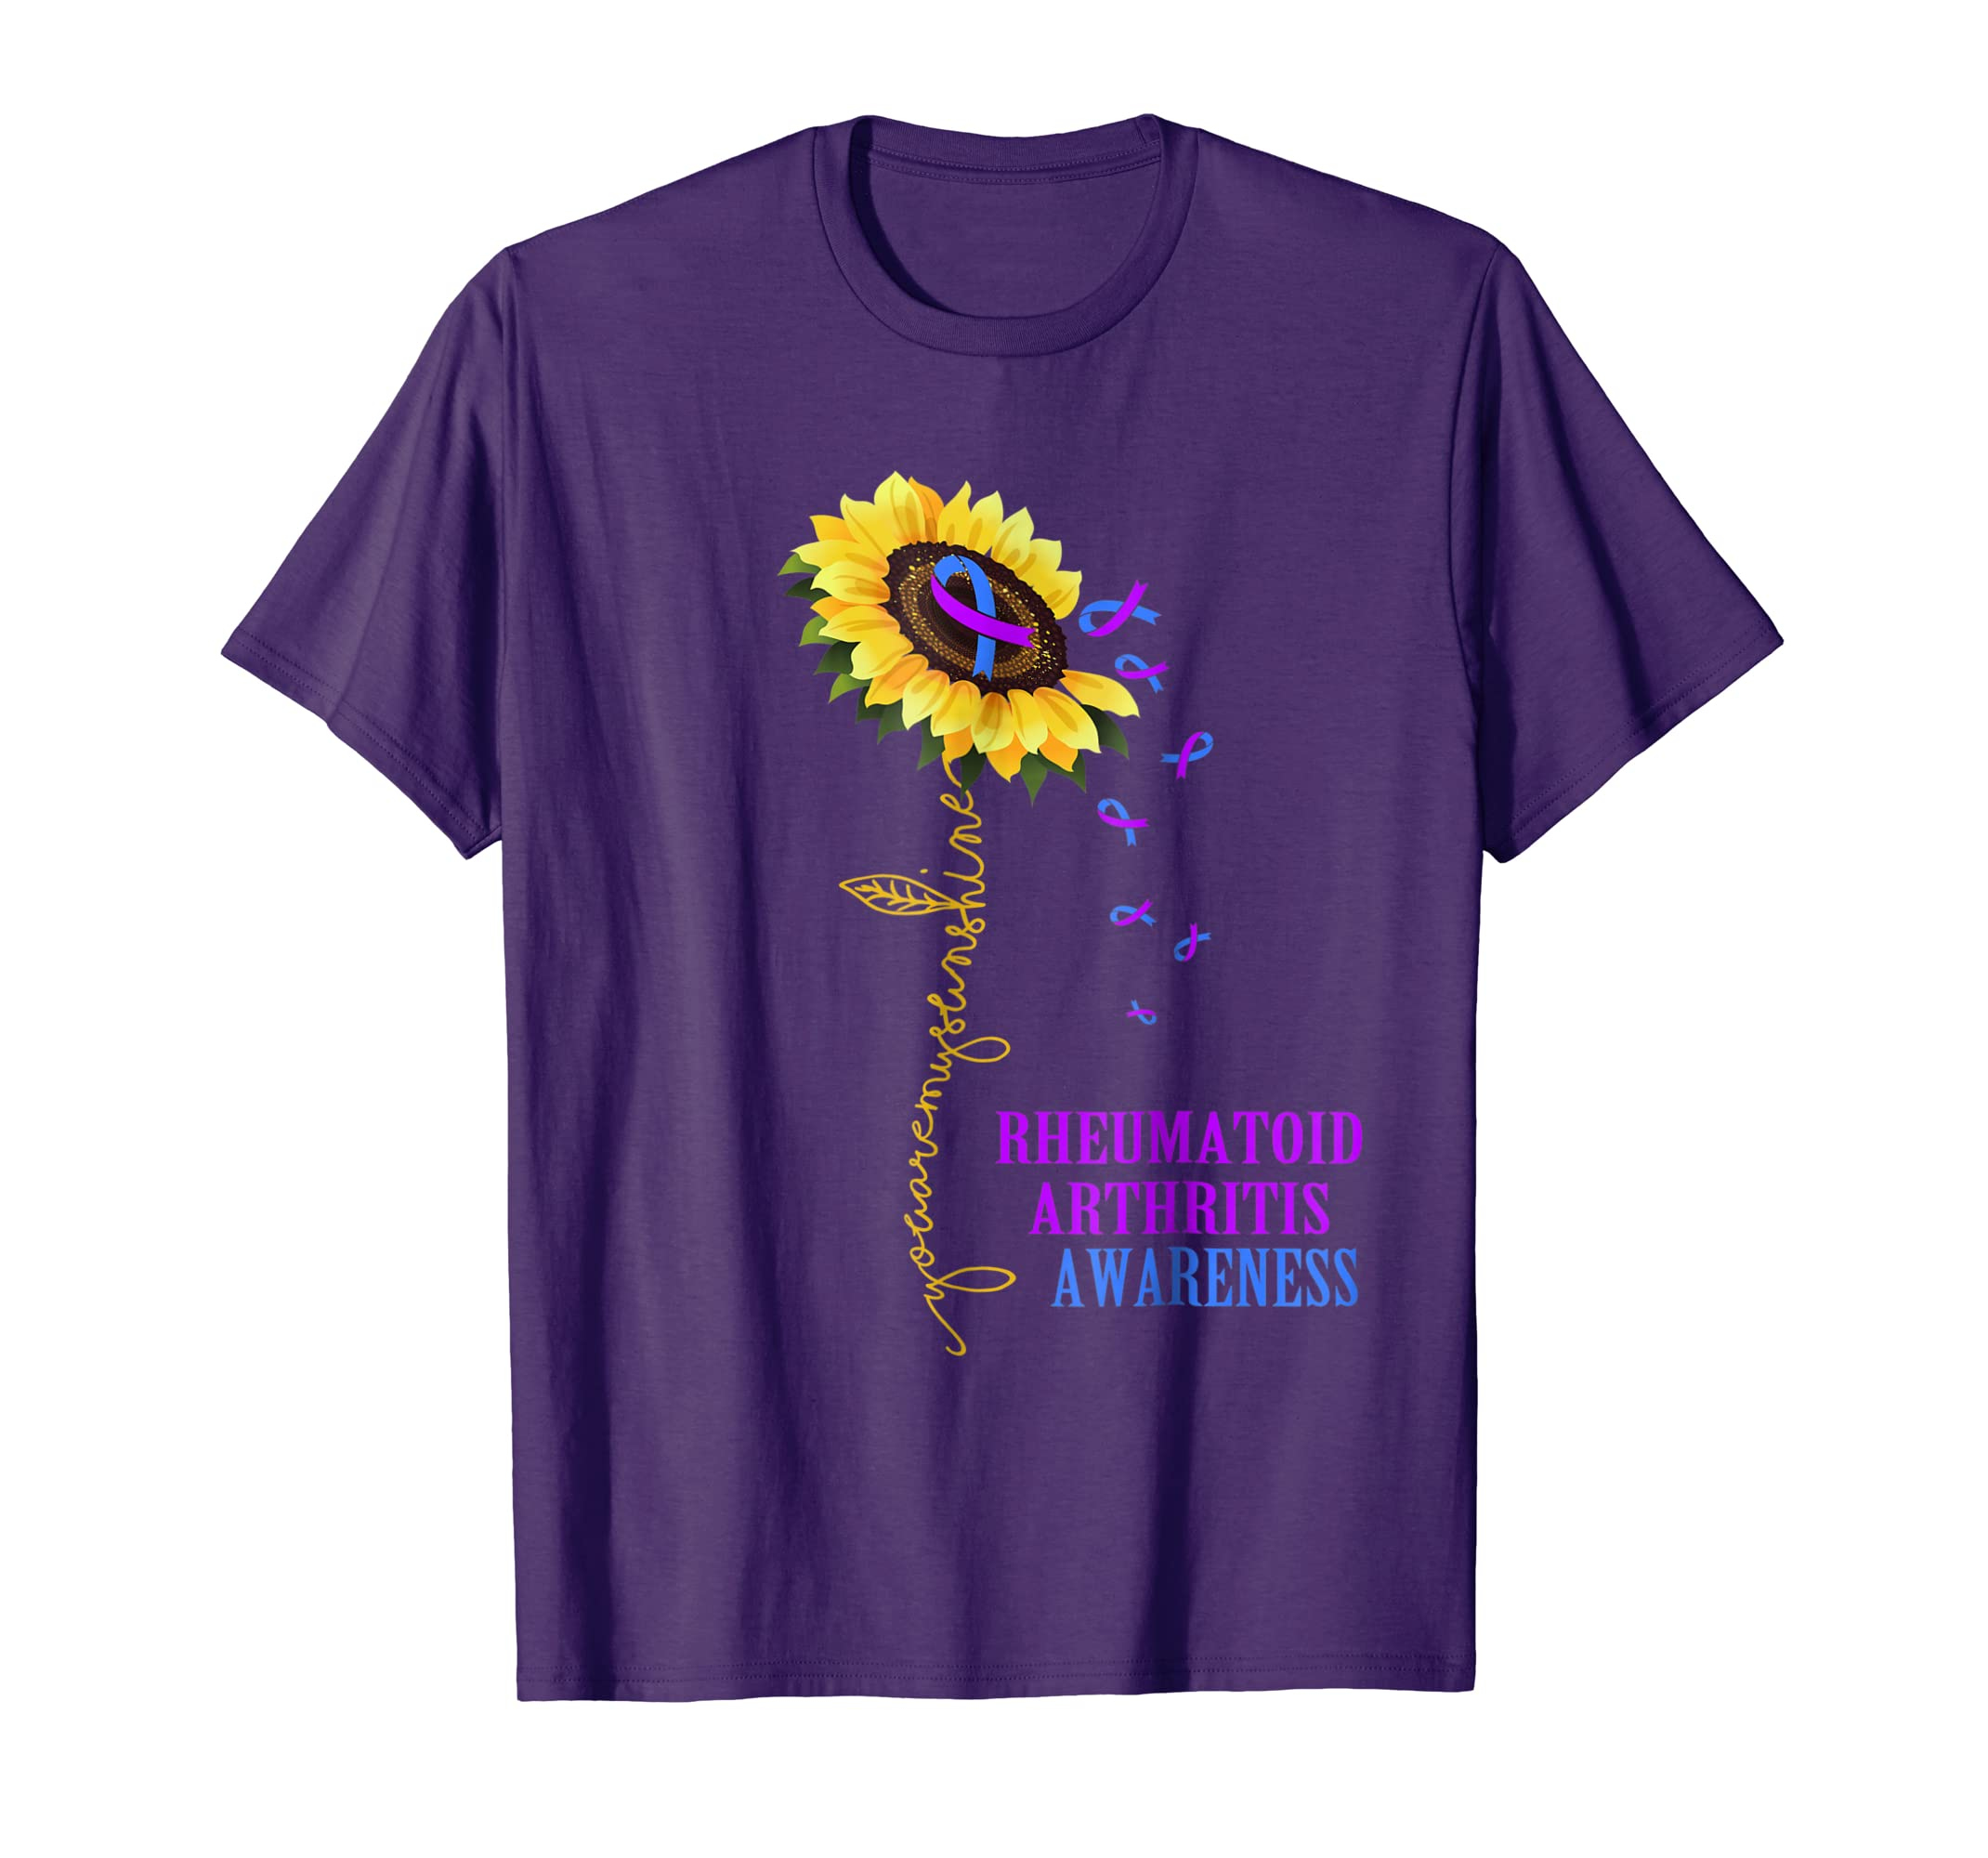 You Are My Sunshine Shirt Rheumatoid Arthritis Awareness-azvn